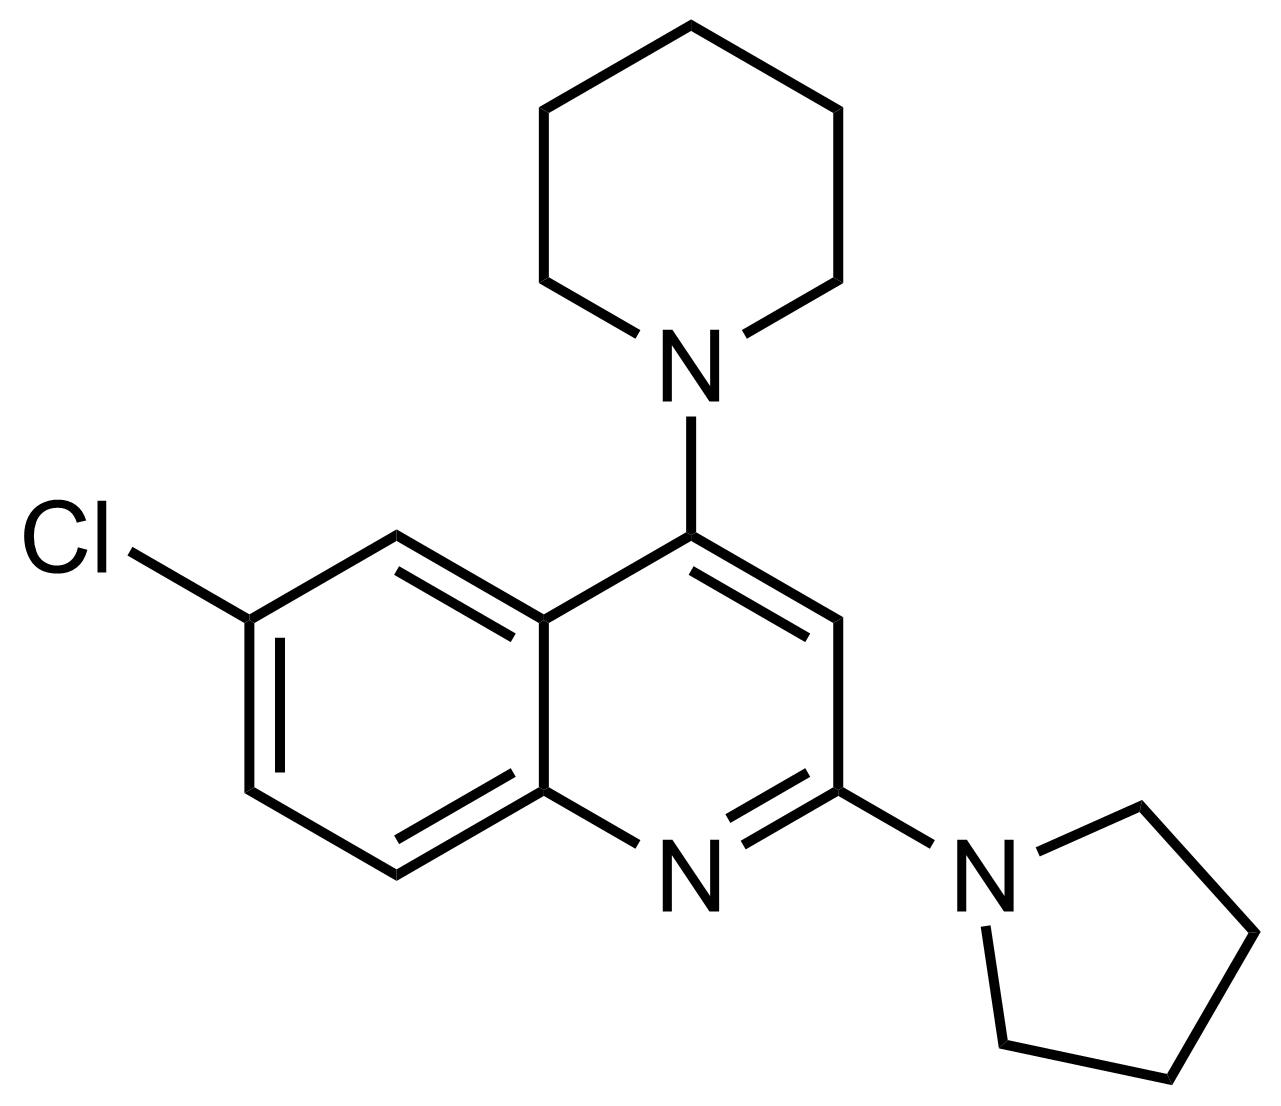 Structure of 6-Chloro-4-(piperidin-1-yl)-2-(pyrrolidin-1-yl)quinoline